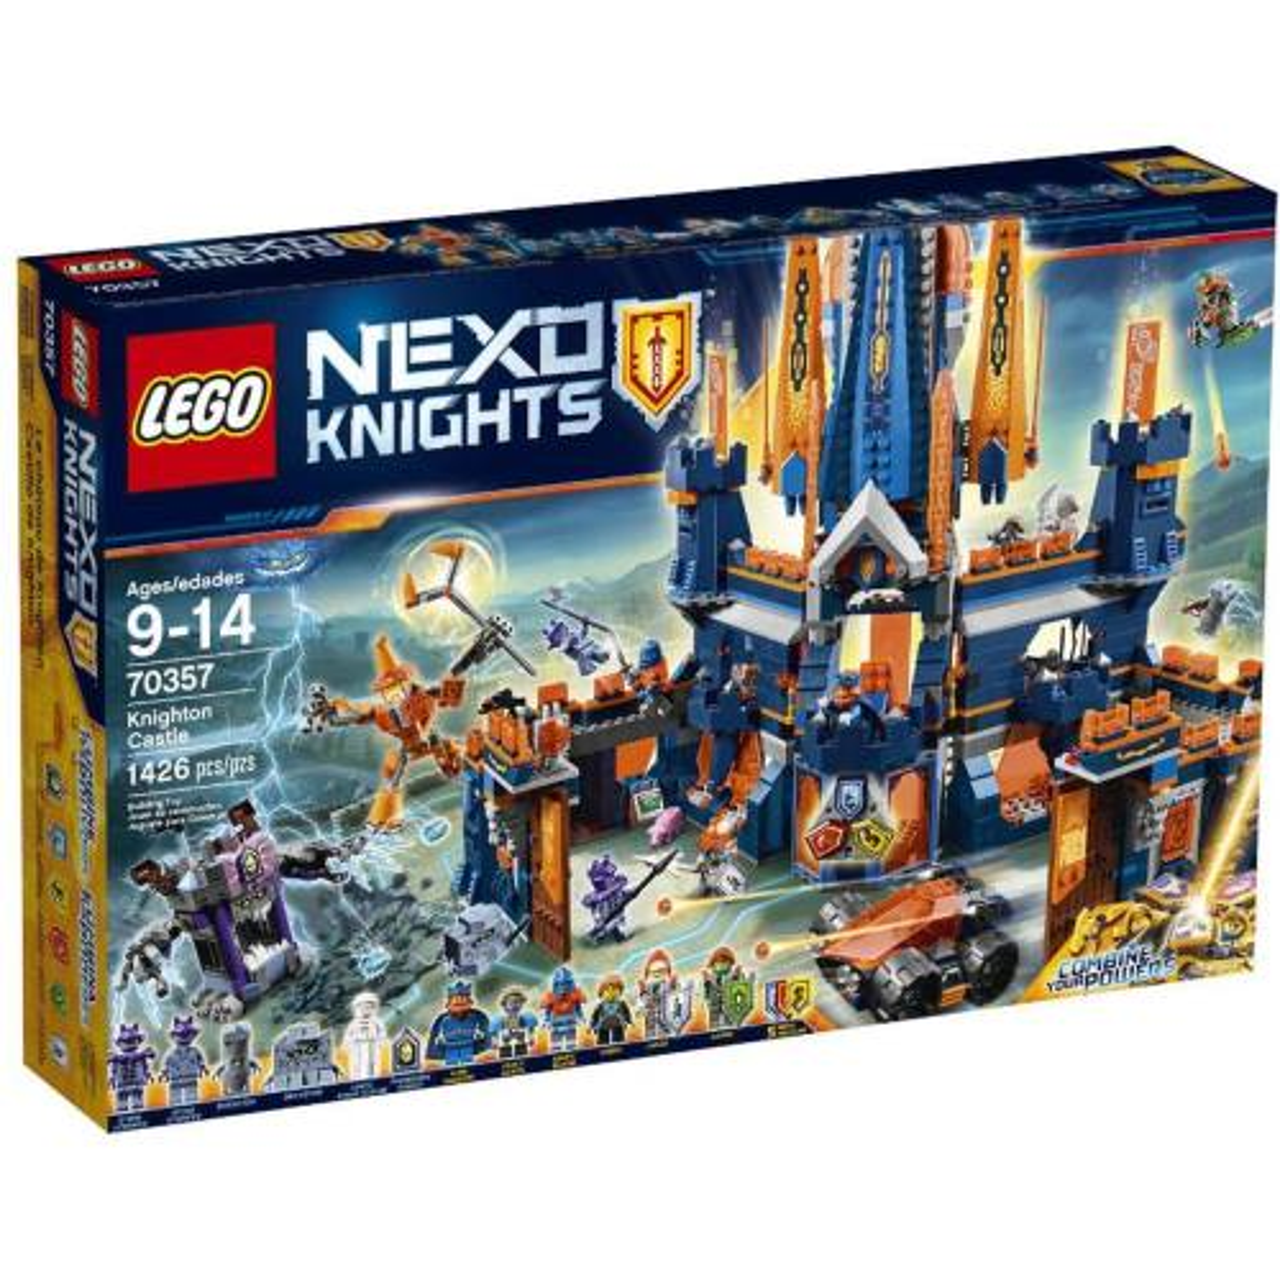 لگو سری Nexo Knights مدل Knighton Castle 70357